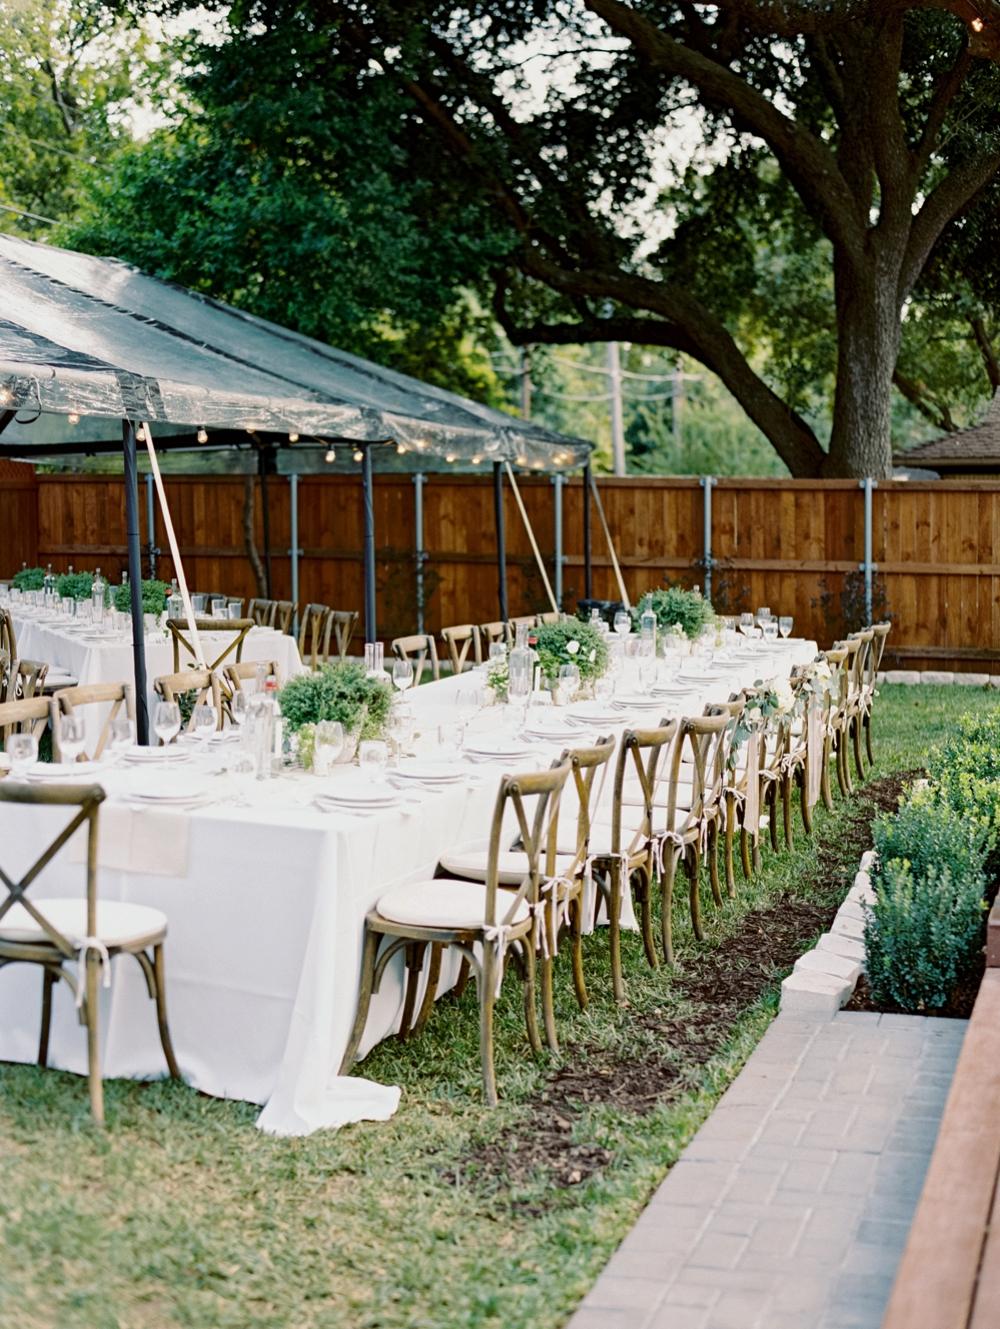 Lindsey Zamora Wedding Planning and Design Dallas